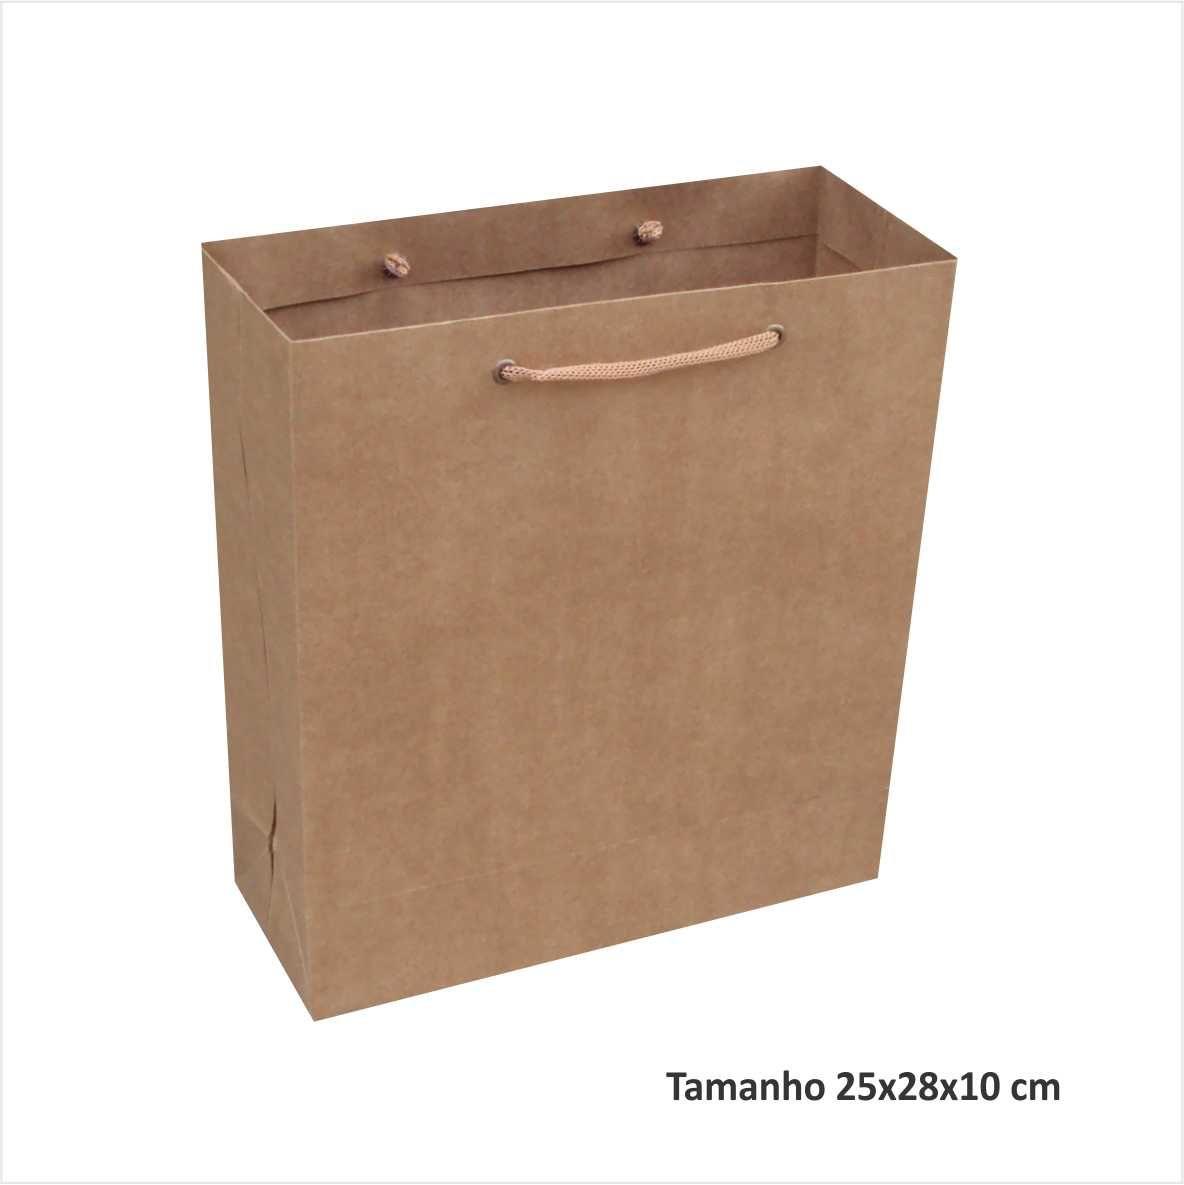 Sacola kraft media (25x28x10 cm) - cor parda - 10 unidades